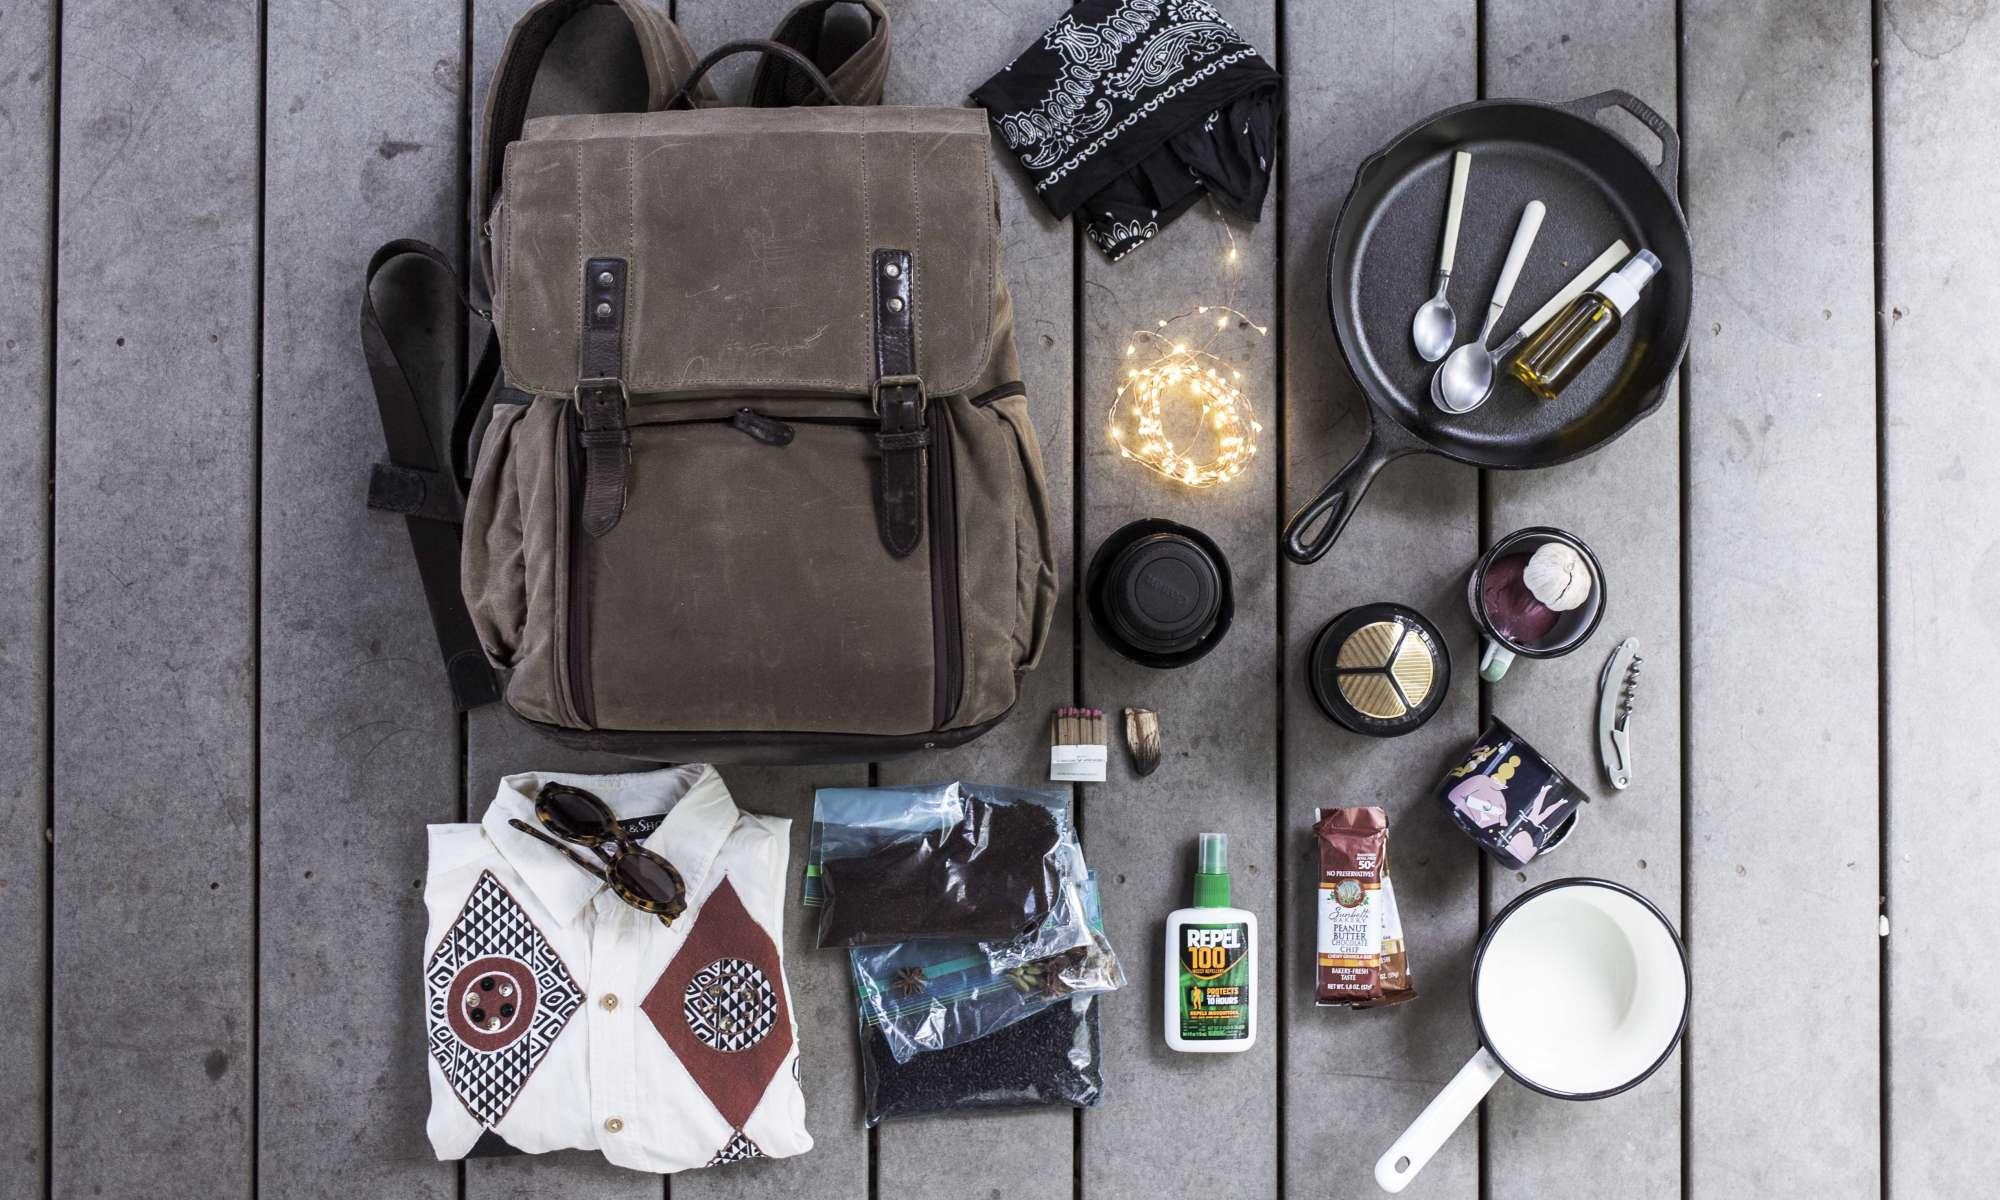 Camping 101: The Ten Essentials